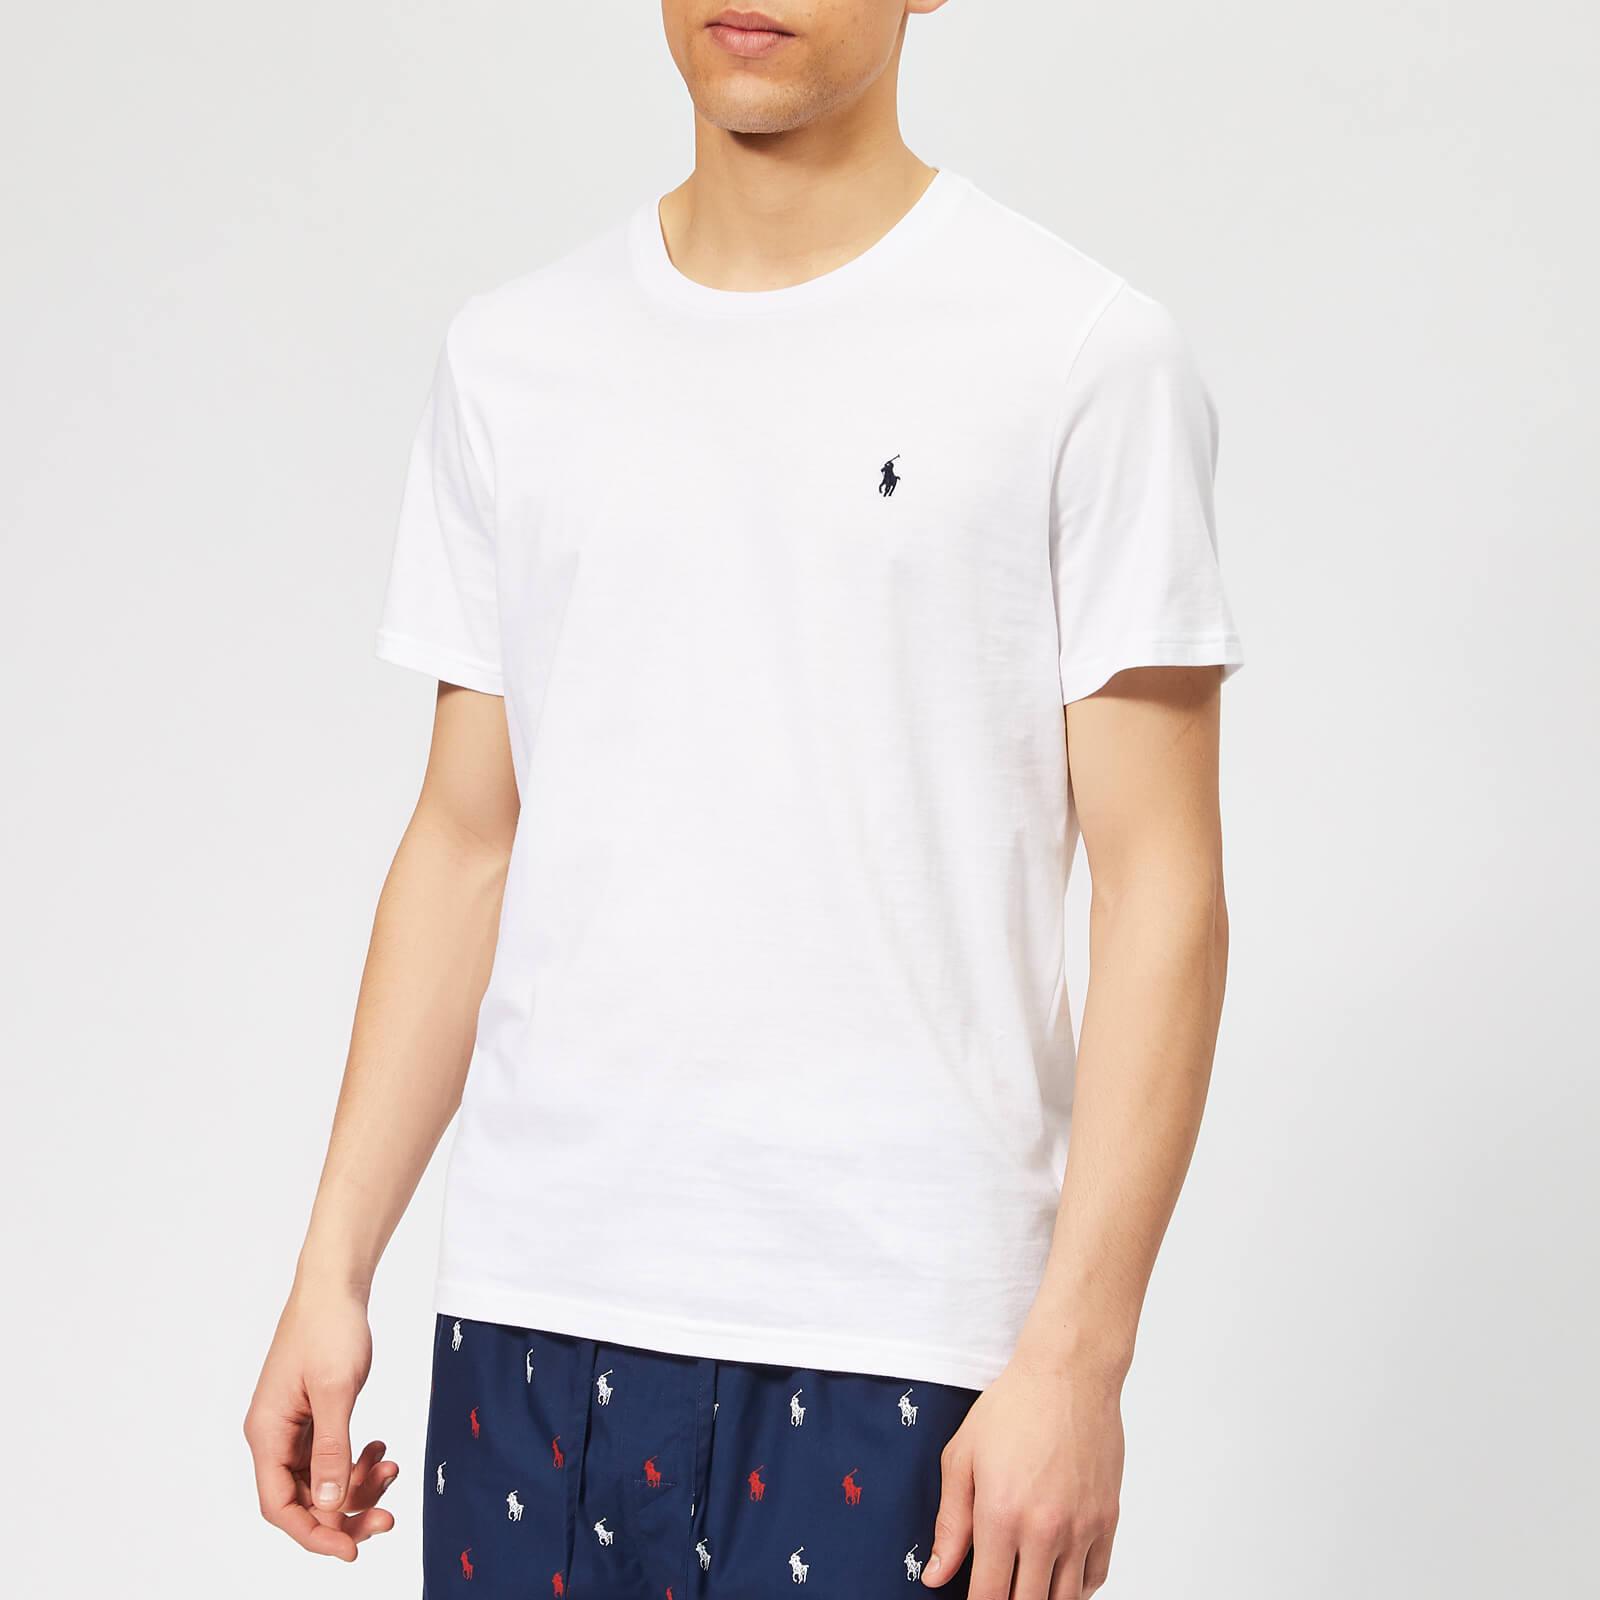 099da21c440 Polo Ralph Lauren Men s Liquid Cotton Jersey T-Shirt - White Clothing